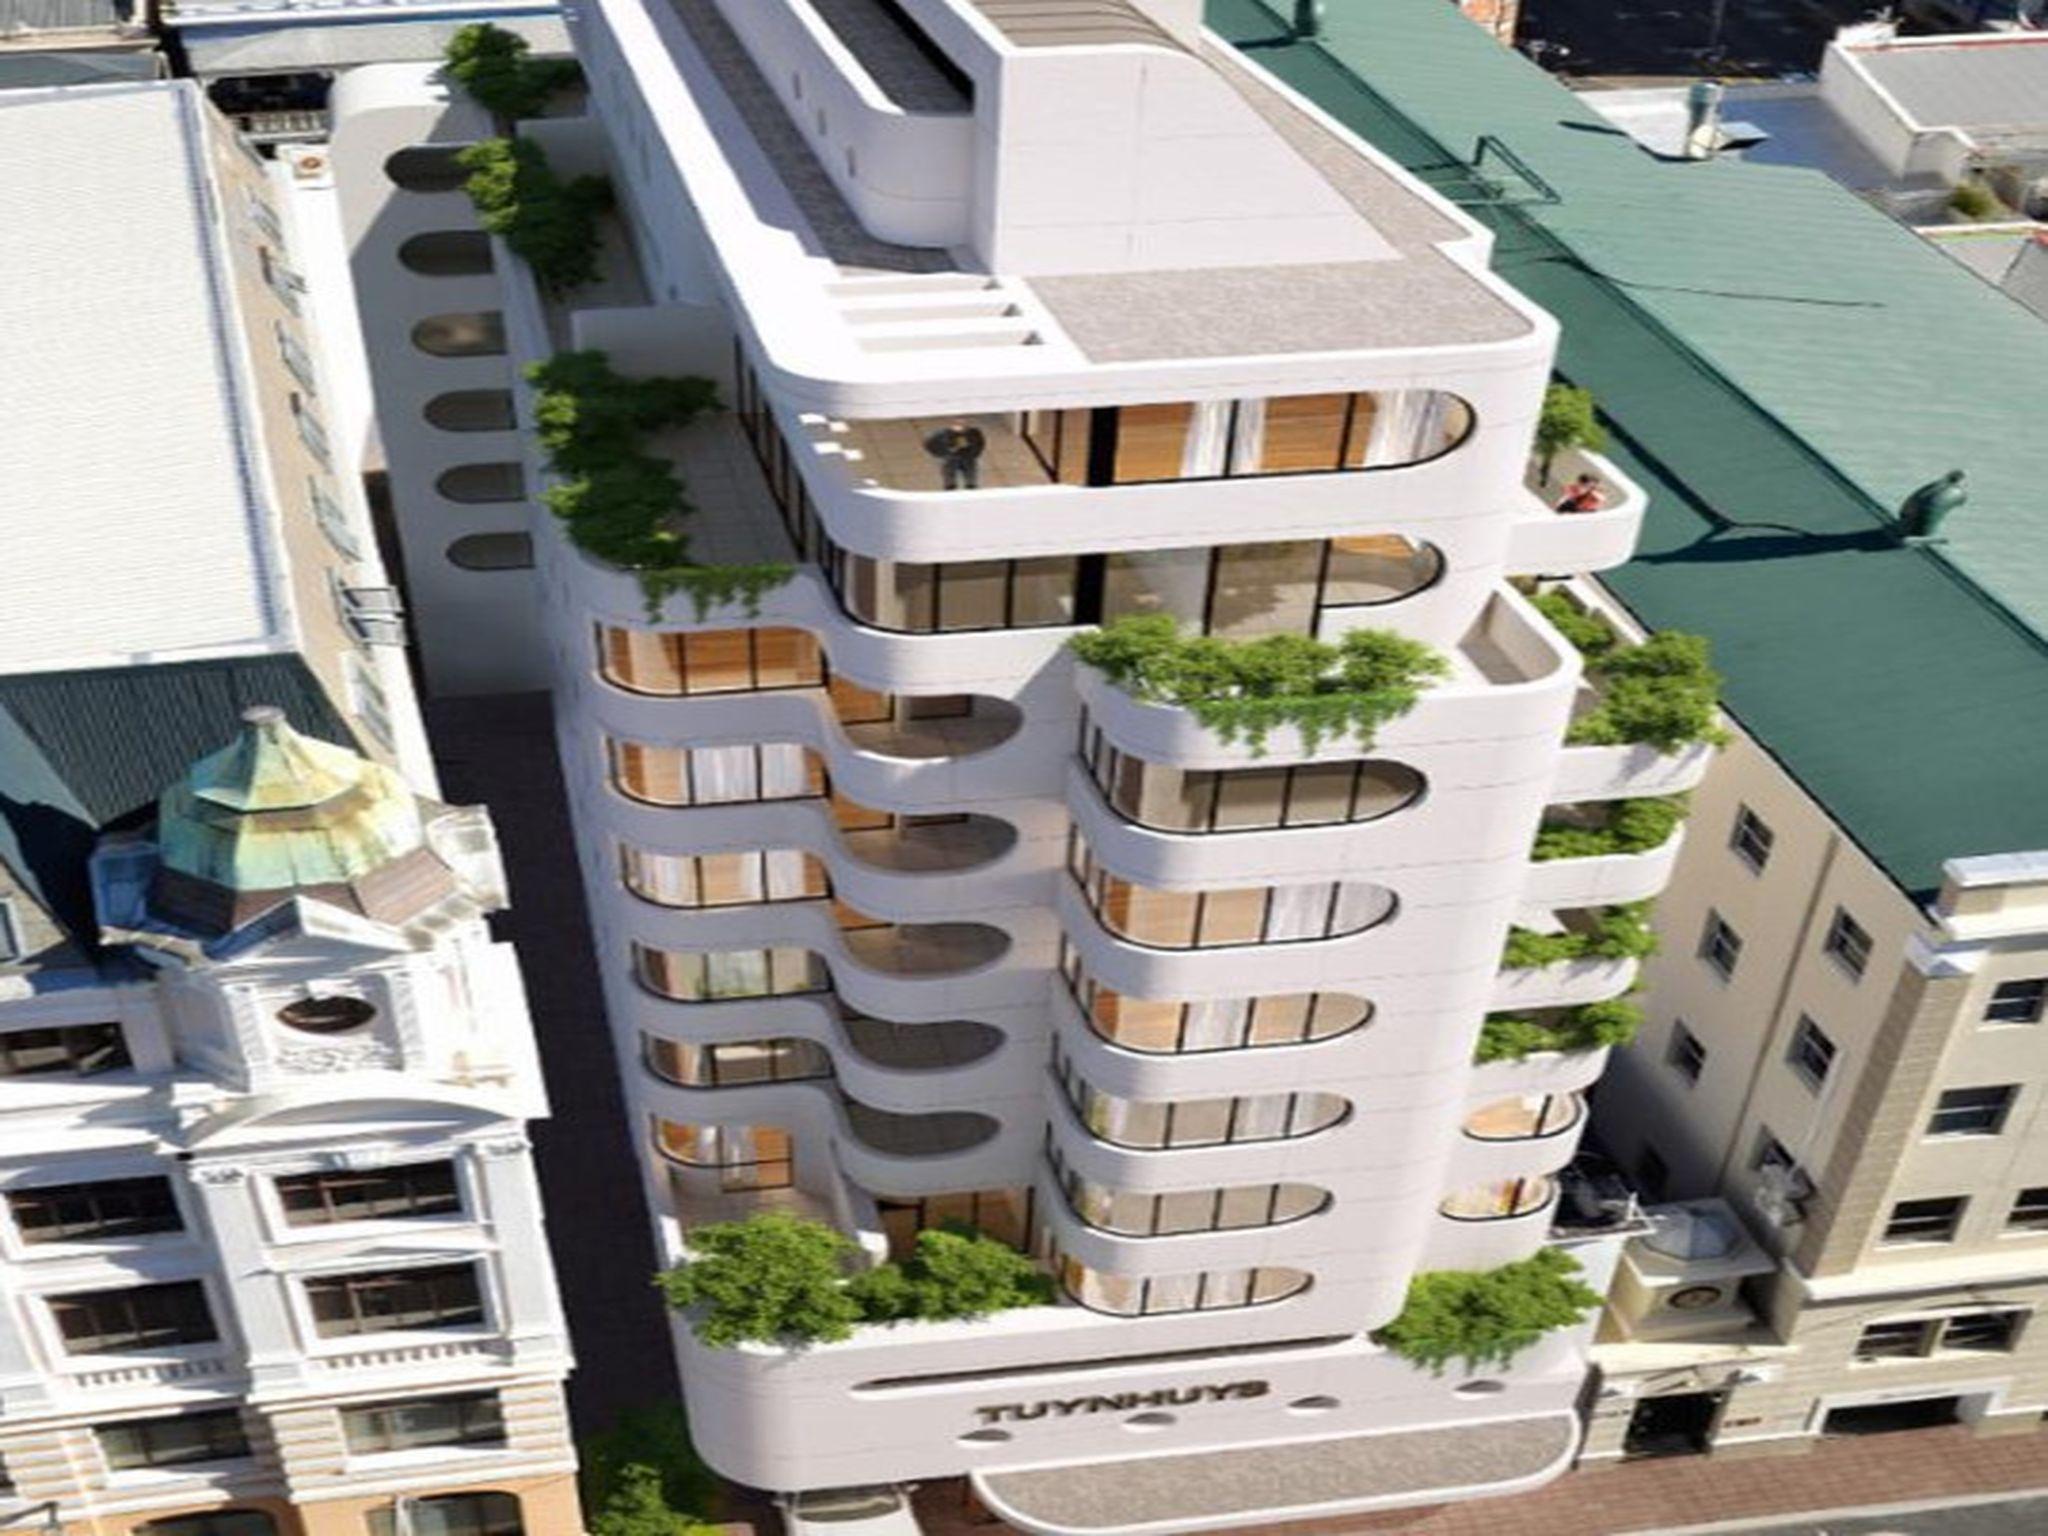 Tuynhuys Luxury Serviced Apartments